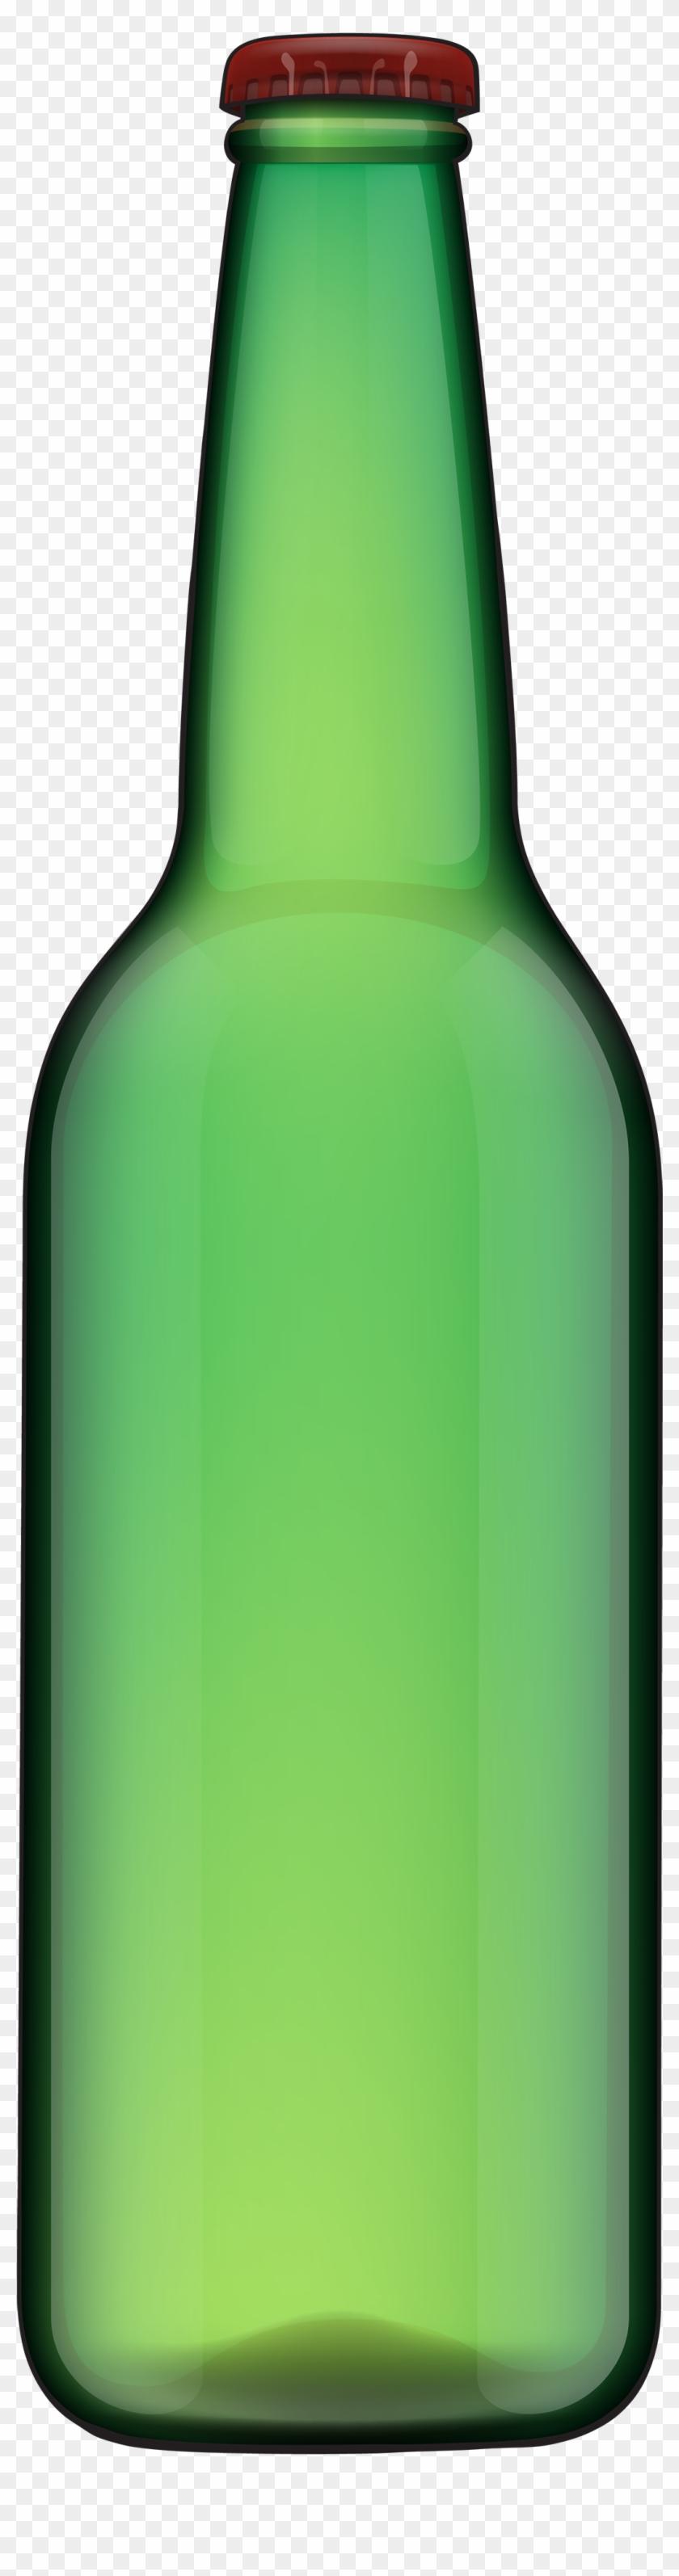 Beer Bottles Irish Flag - Beer Bottle #21073